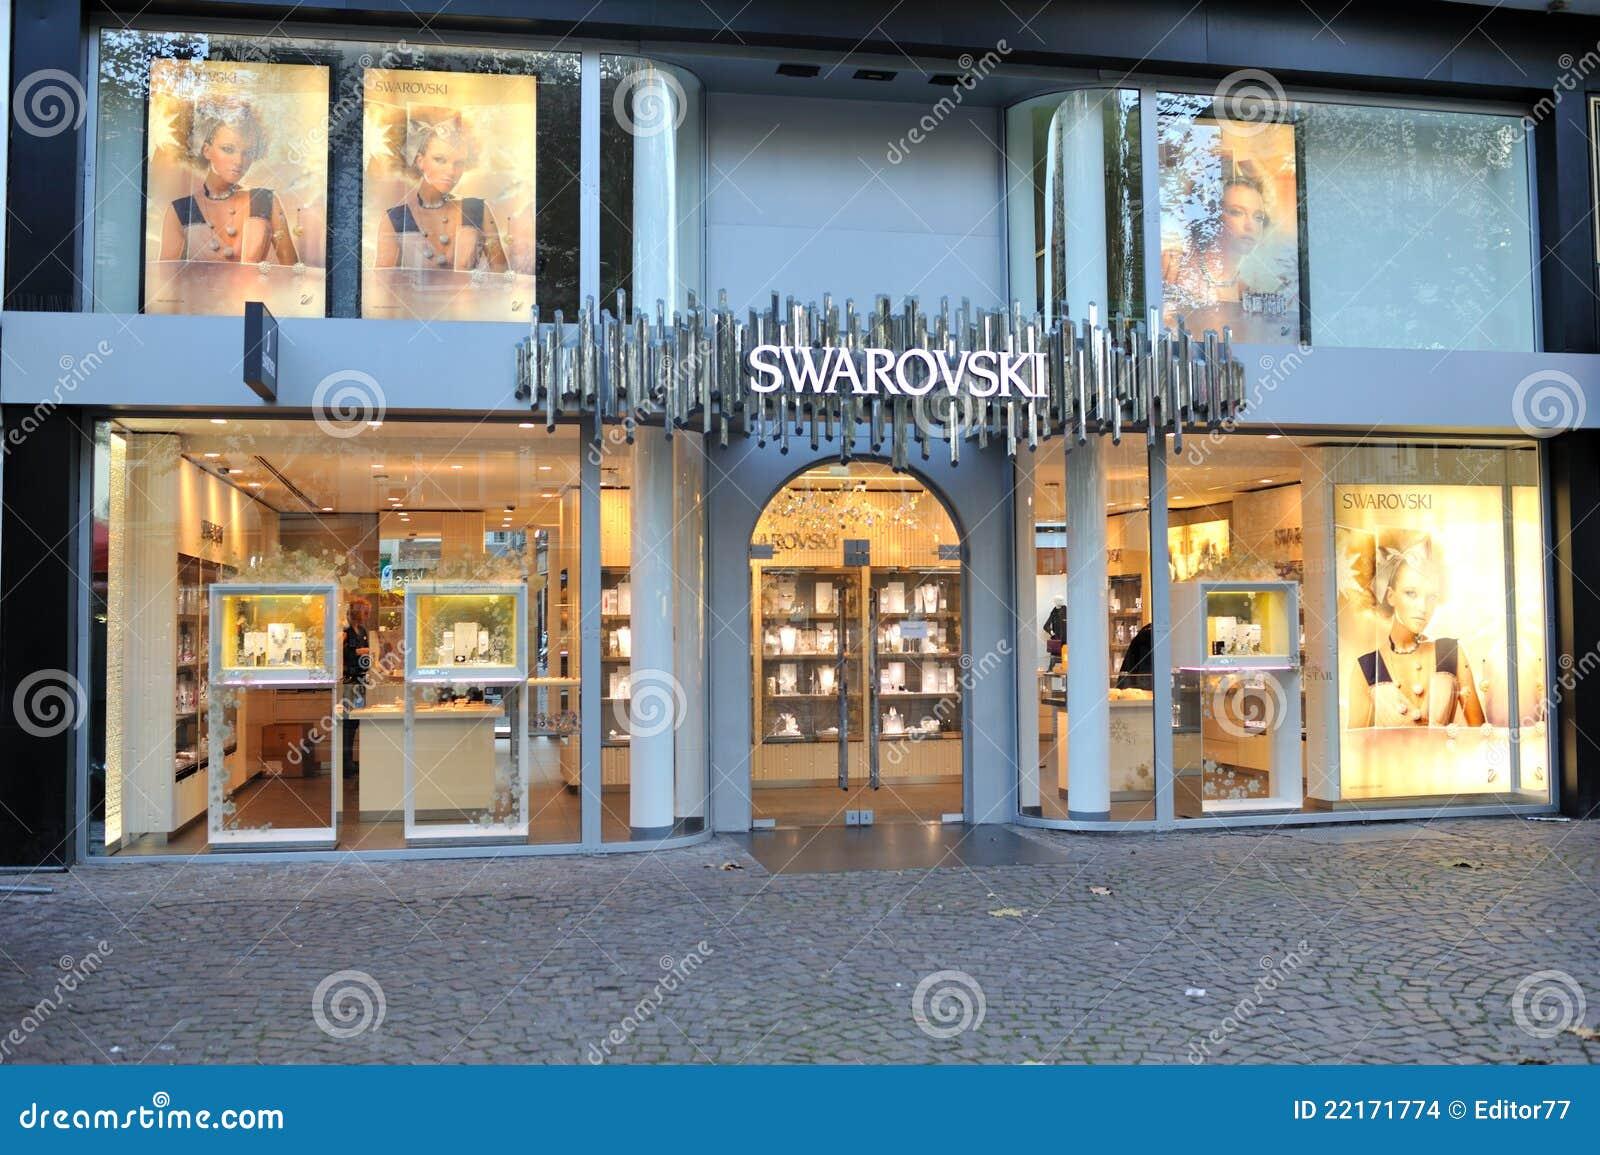 Swarovski Jewelry Store Front View Editorial Stock Image